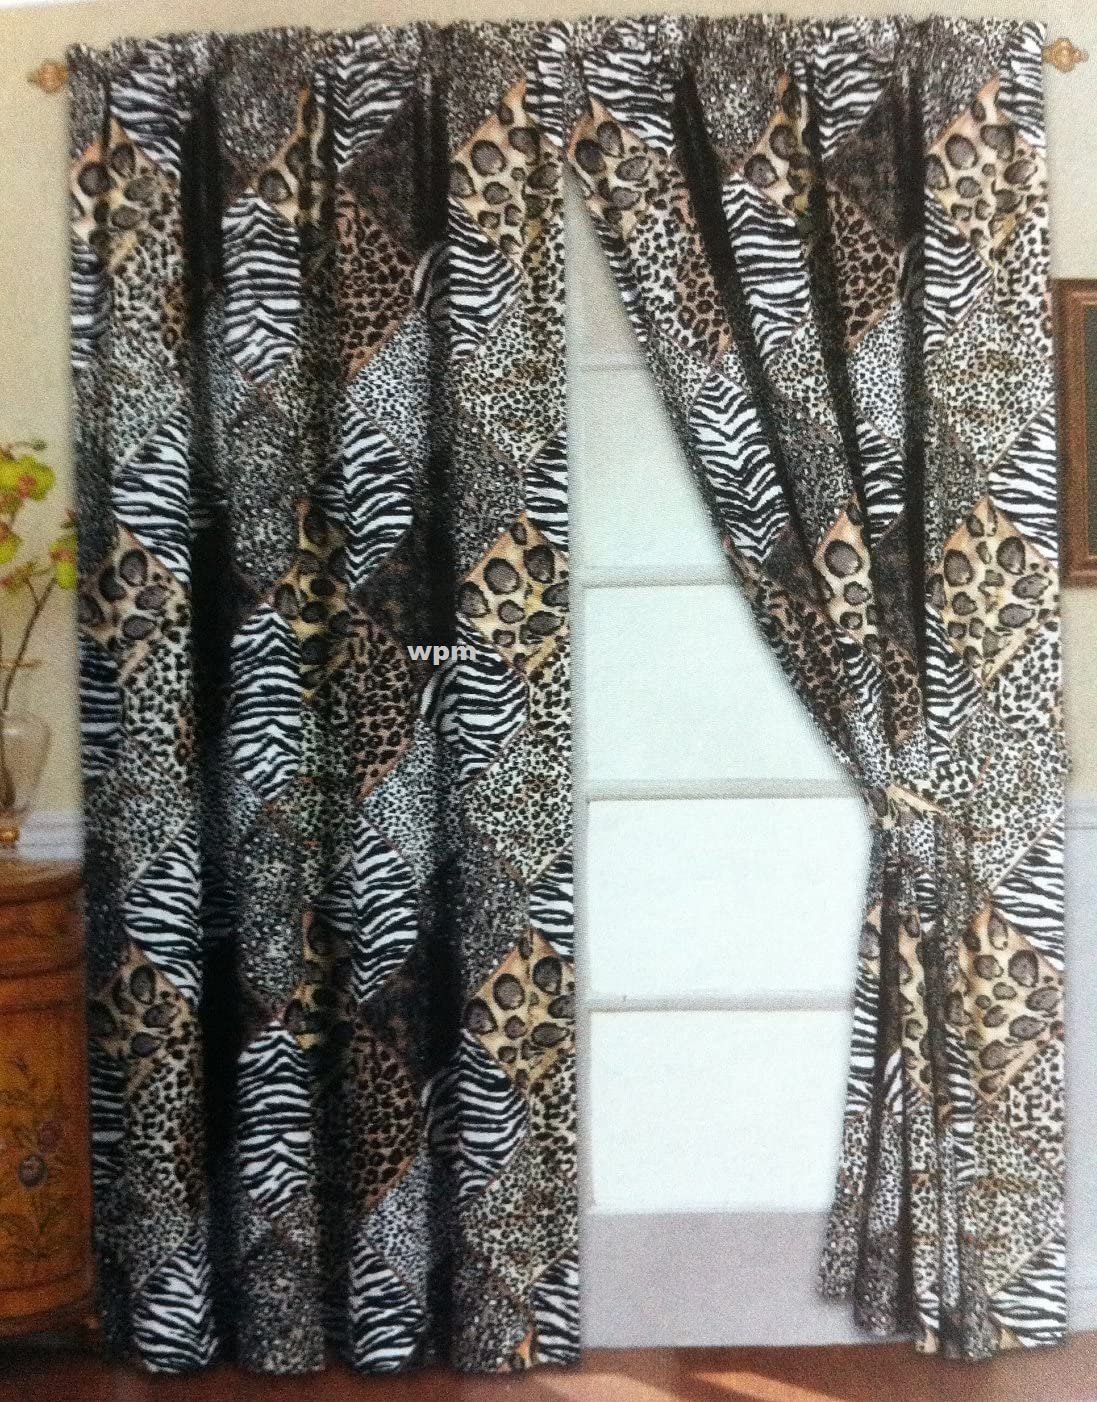 4 Piece Curtain Set: 2 Jungle Safari Black White Giraffe Zebra Panels & 2 Tie Backs